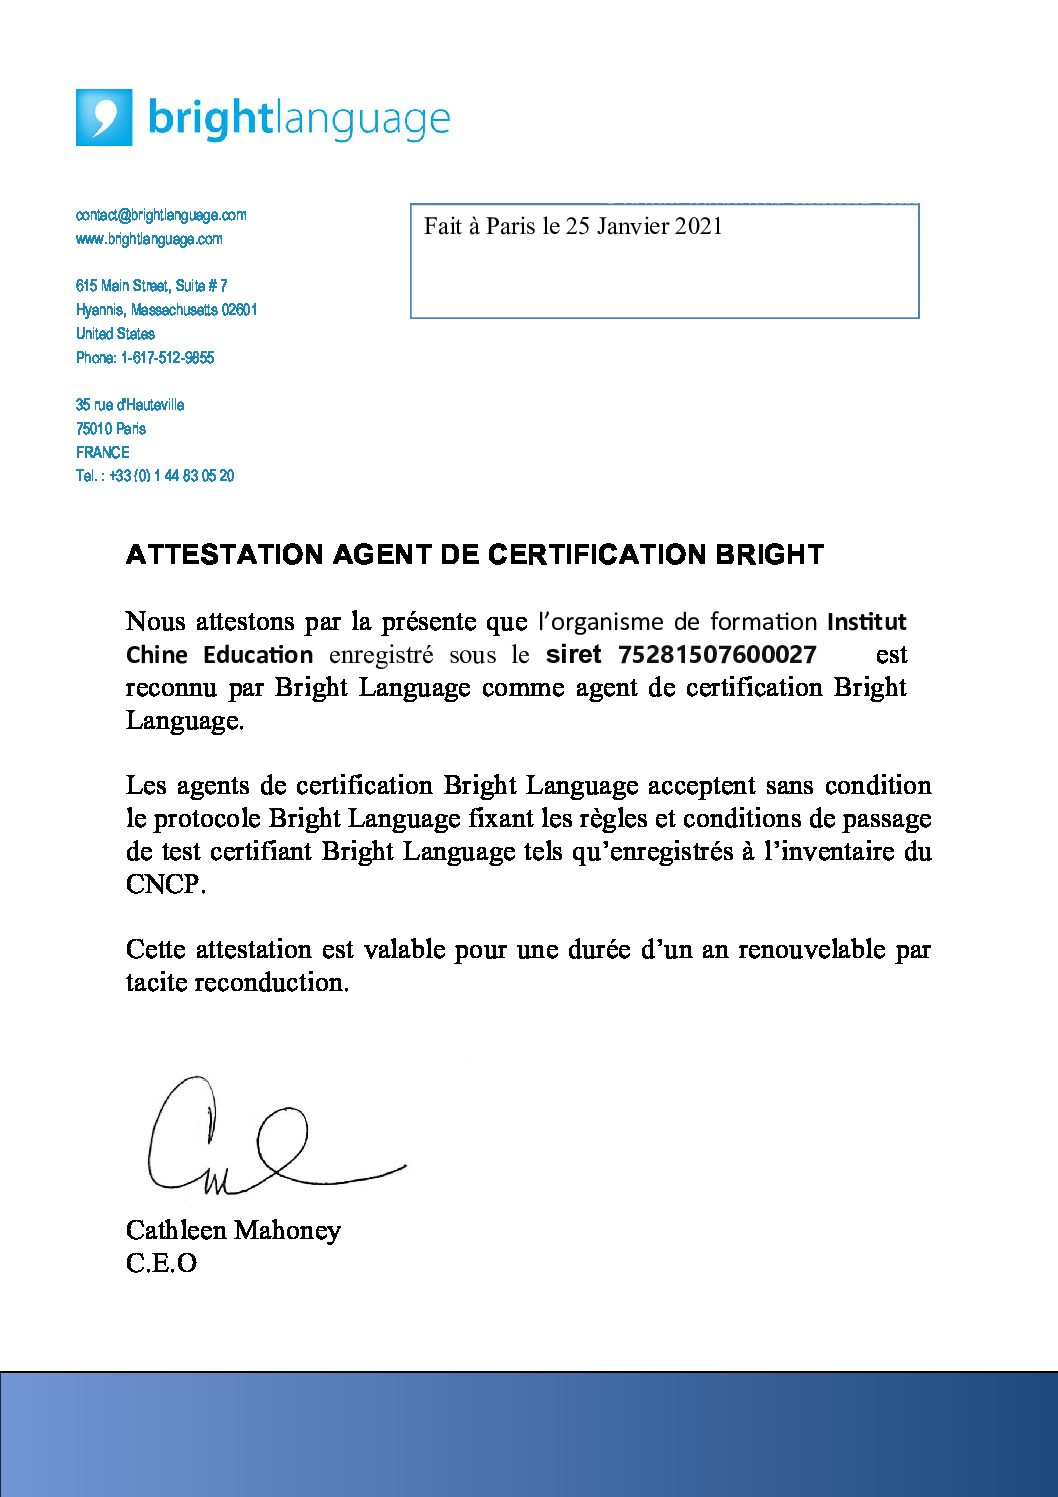 Attestation Institut Chine Education (1)